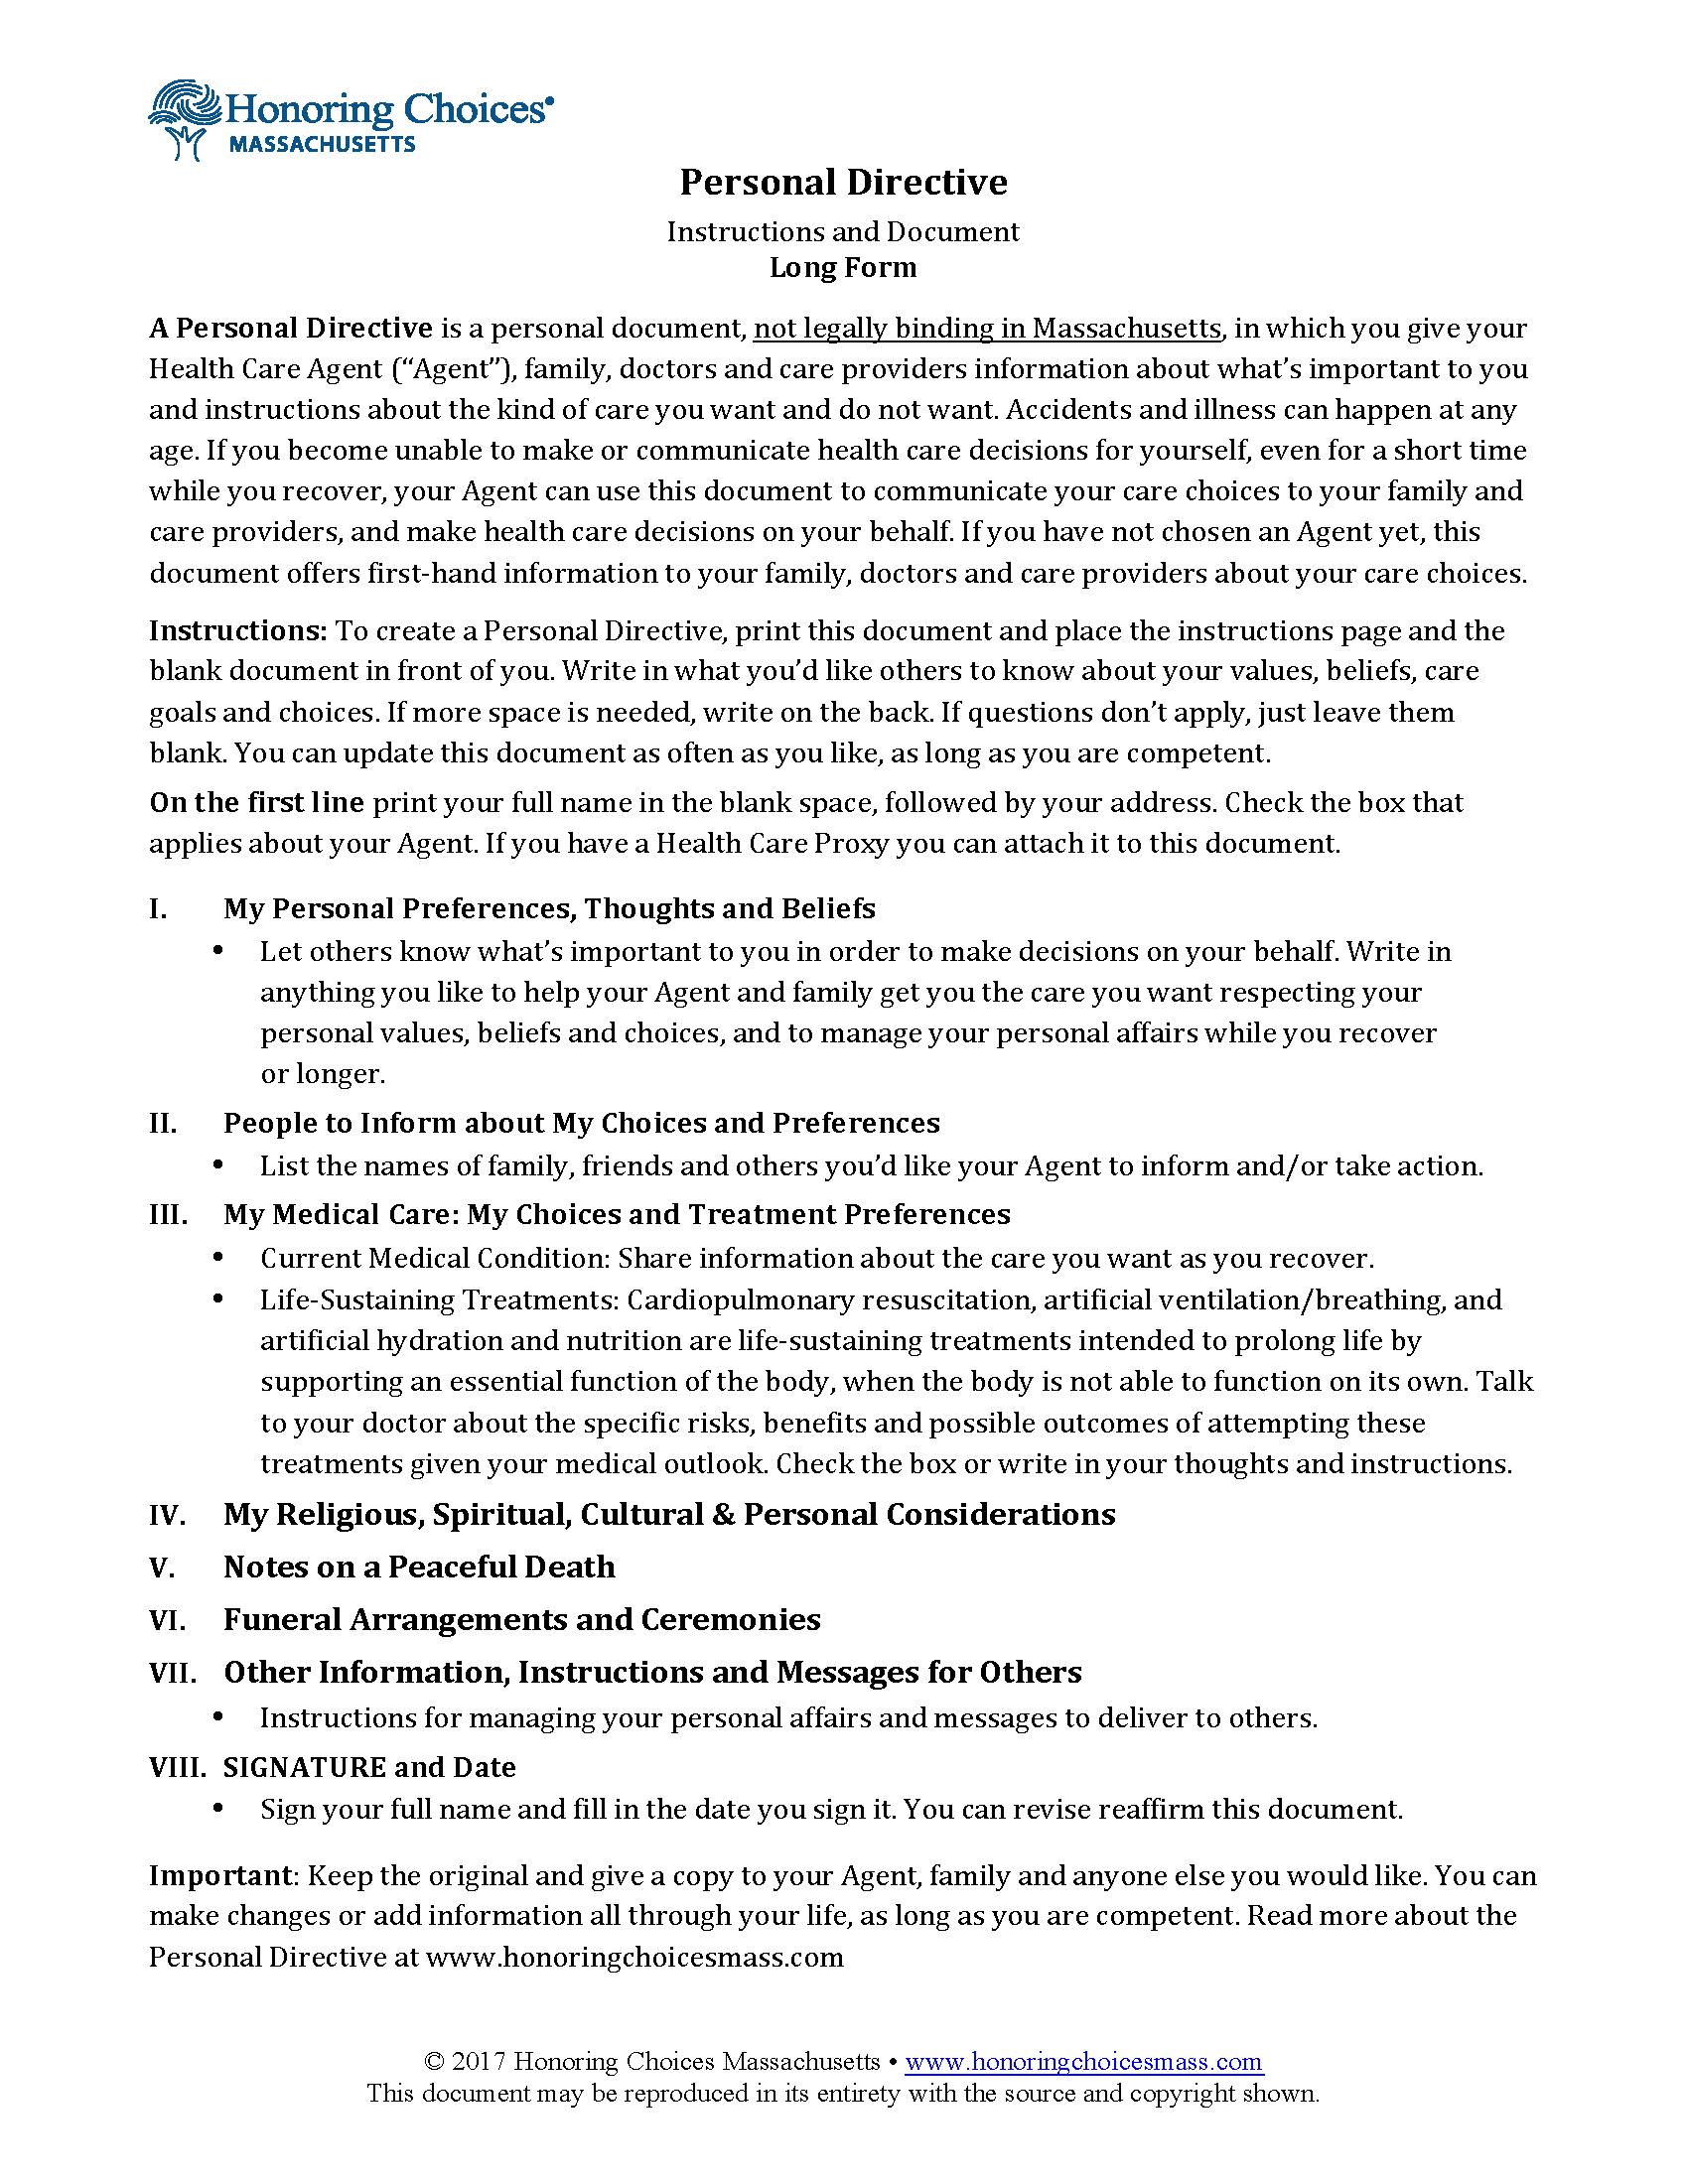 Massachusetts Advance Directive For Health Care